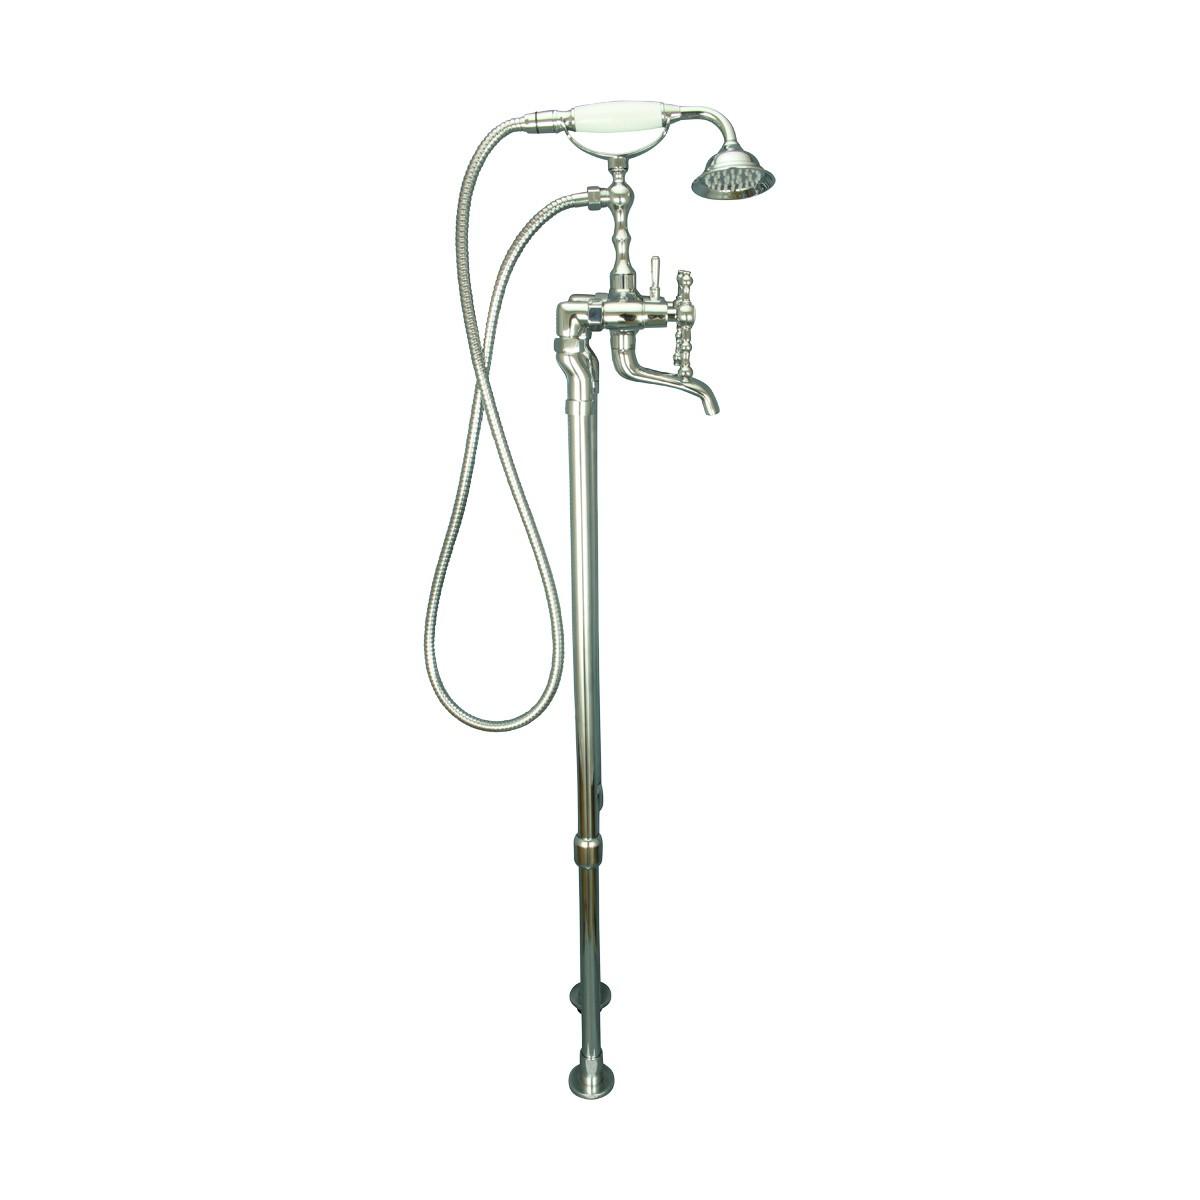 ... U003cPREu003eClawfoot Tub Faucet Freestanding Handheld Shower Chrome ...